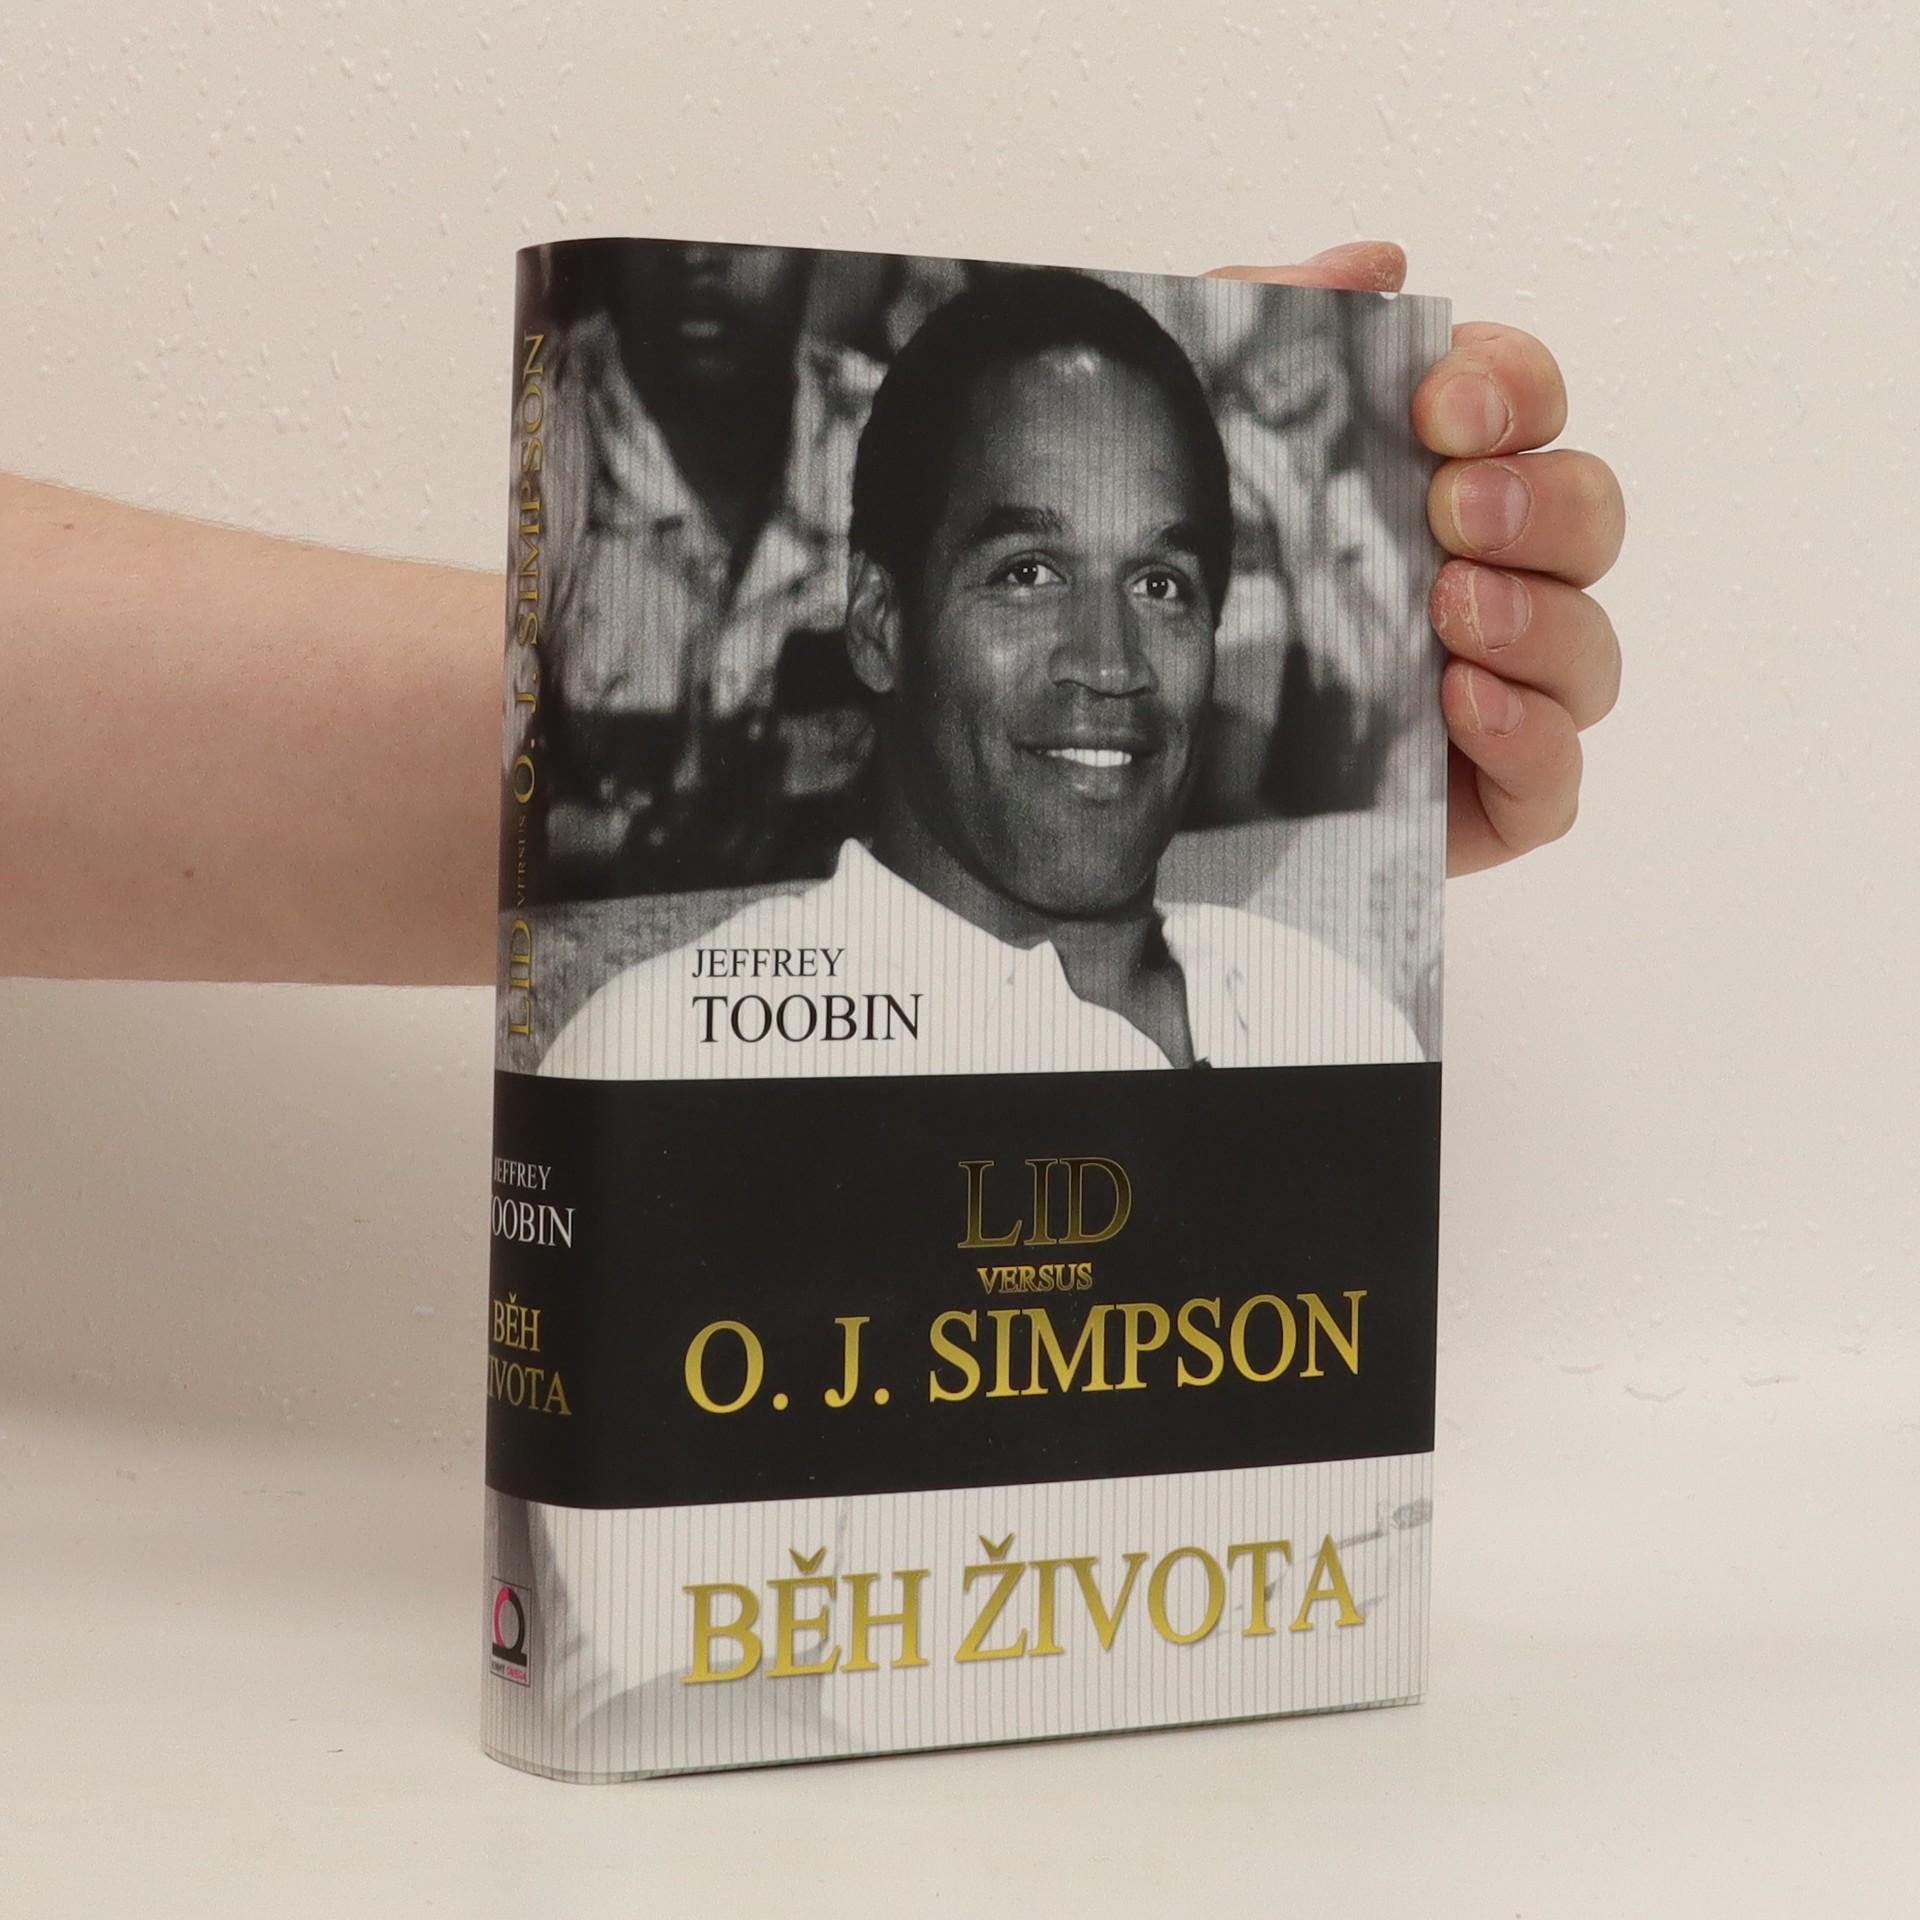 antikvární kniha Běh života : lid versus O.J. Simpson, 2017